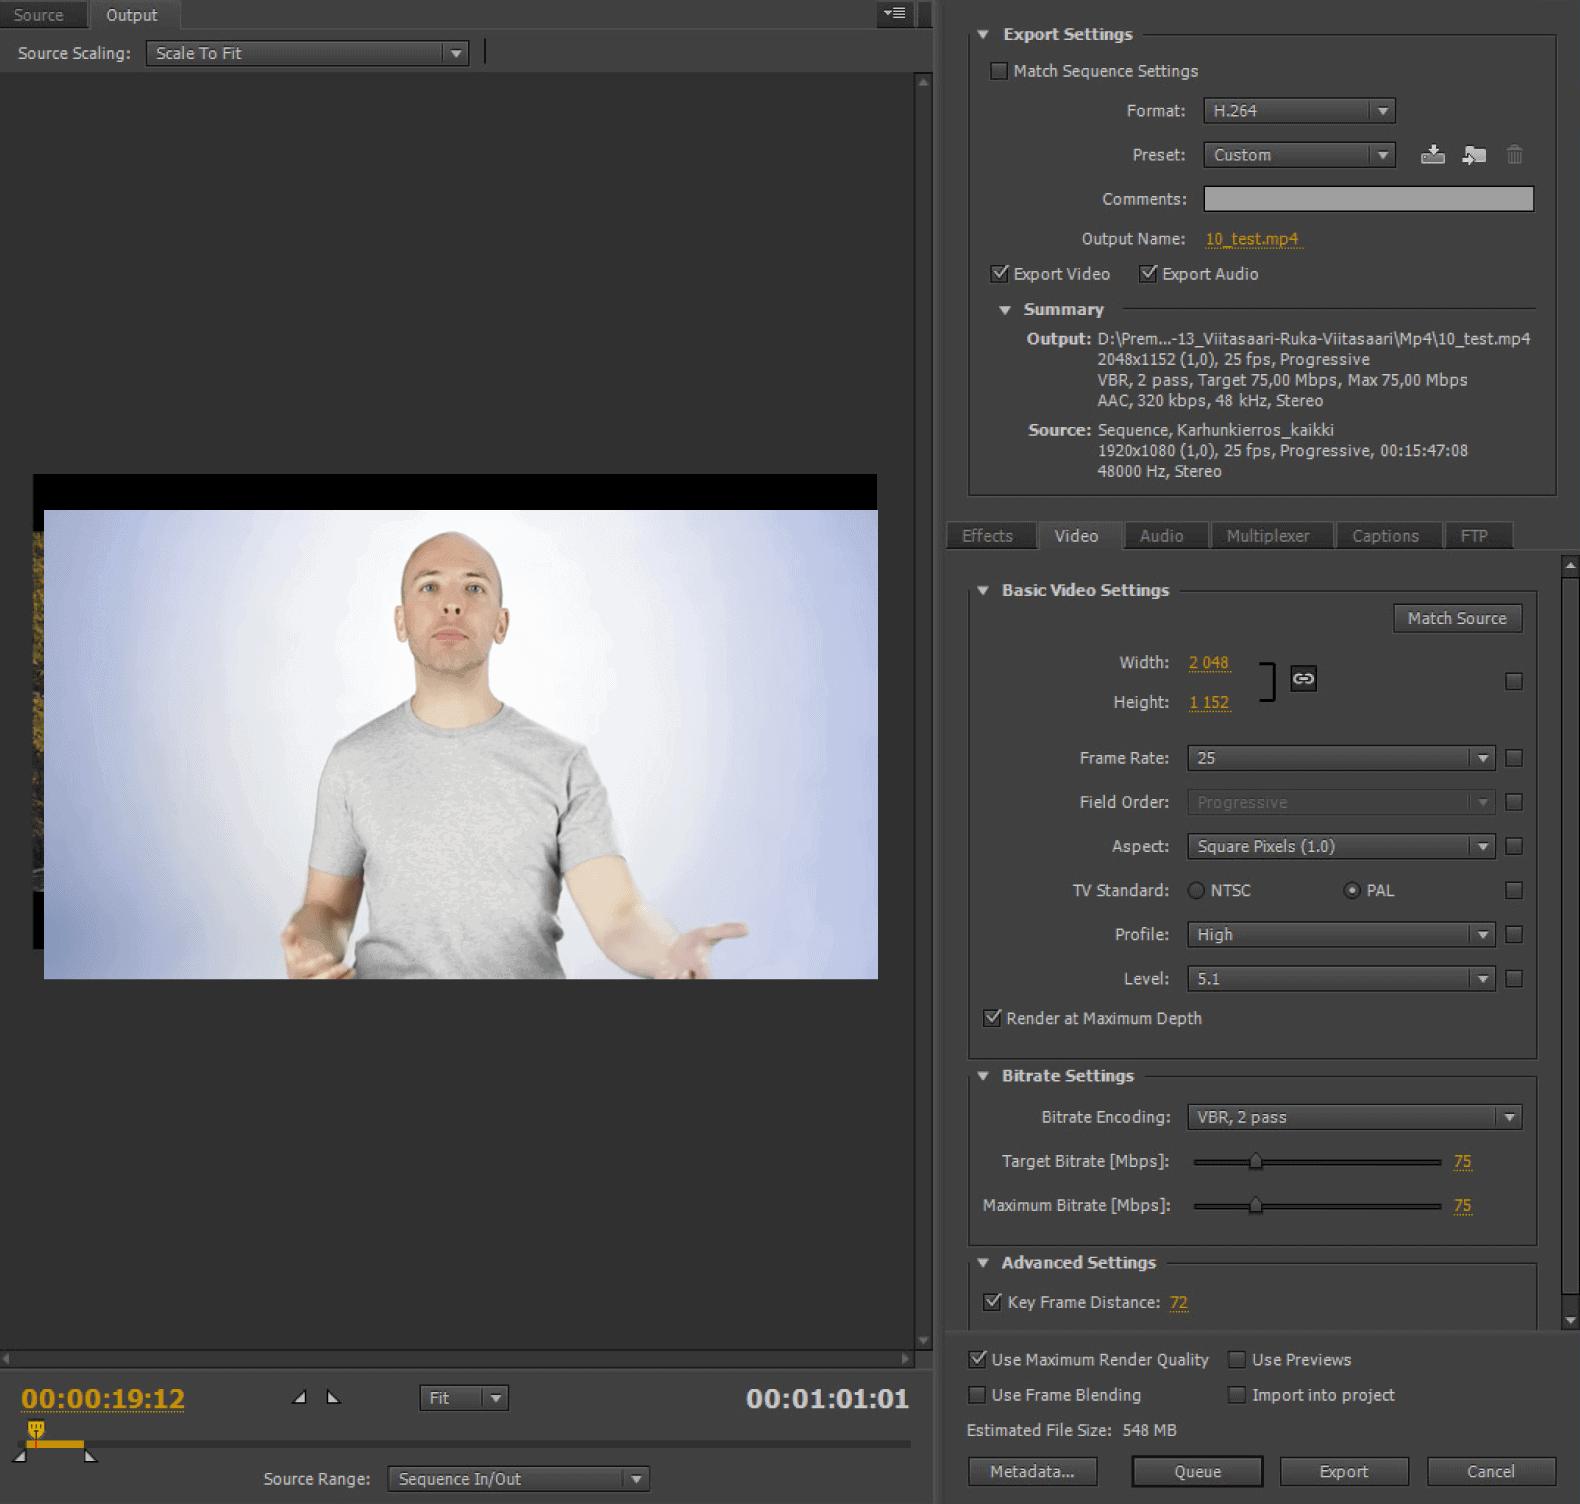 Adobe Premiere export